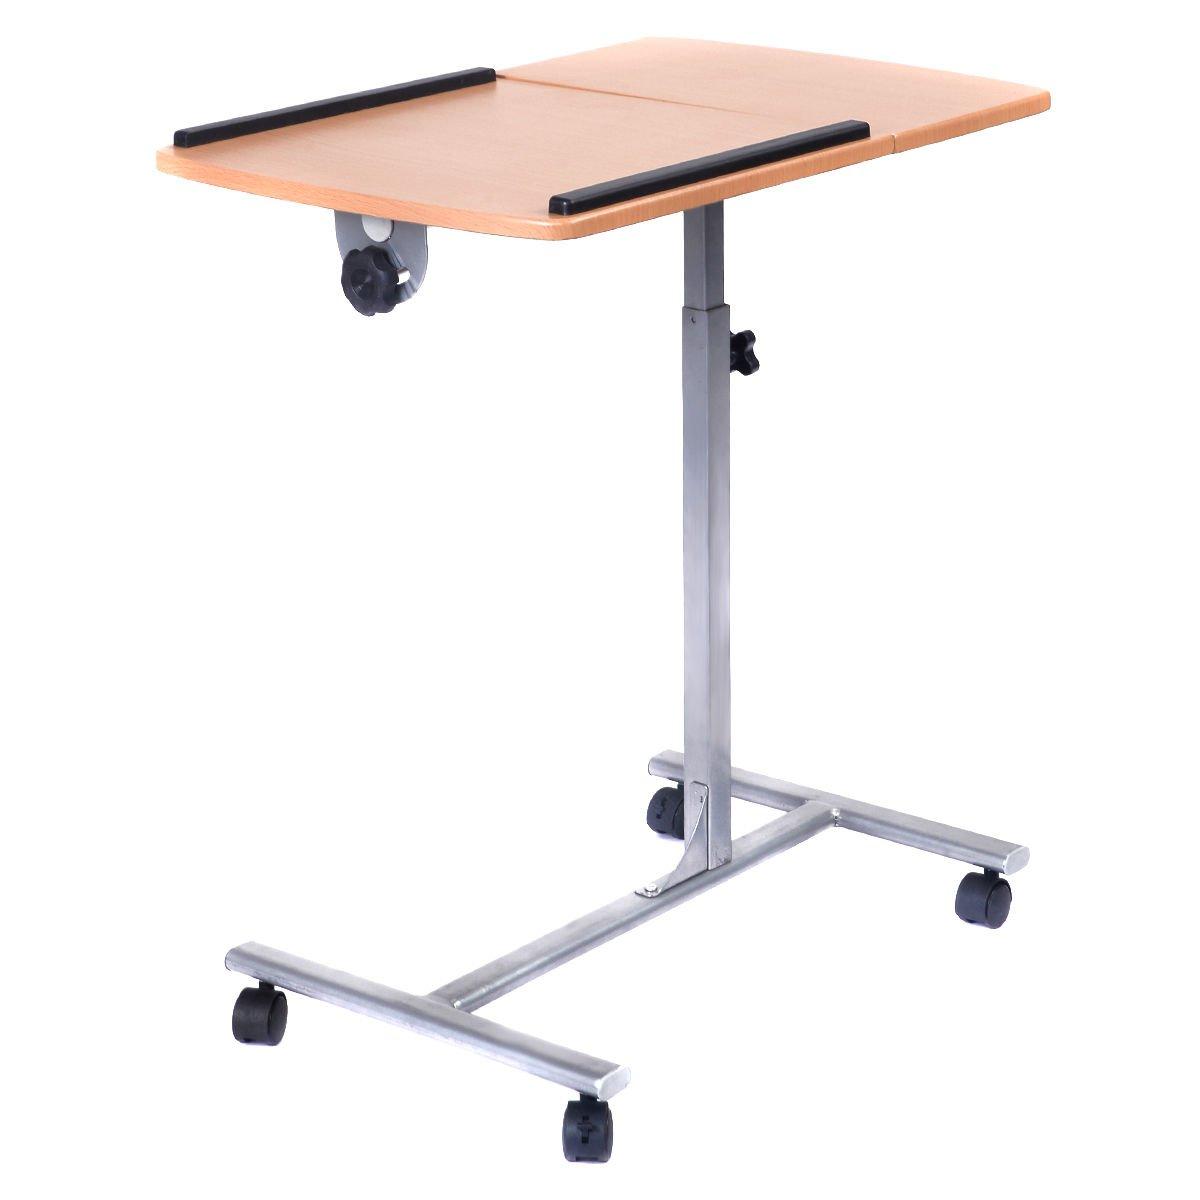 Amazon.com : Adjustable Laptop Notebook Desk Table Stand Holder ...